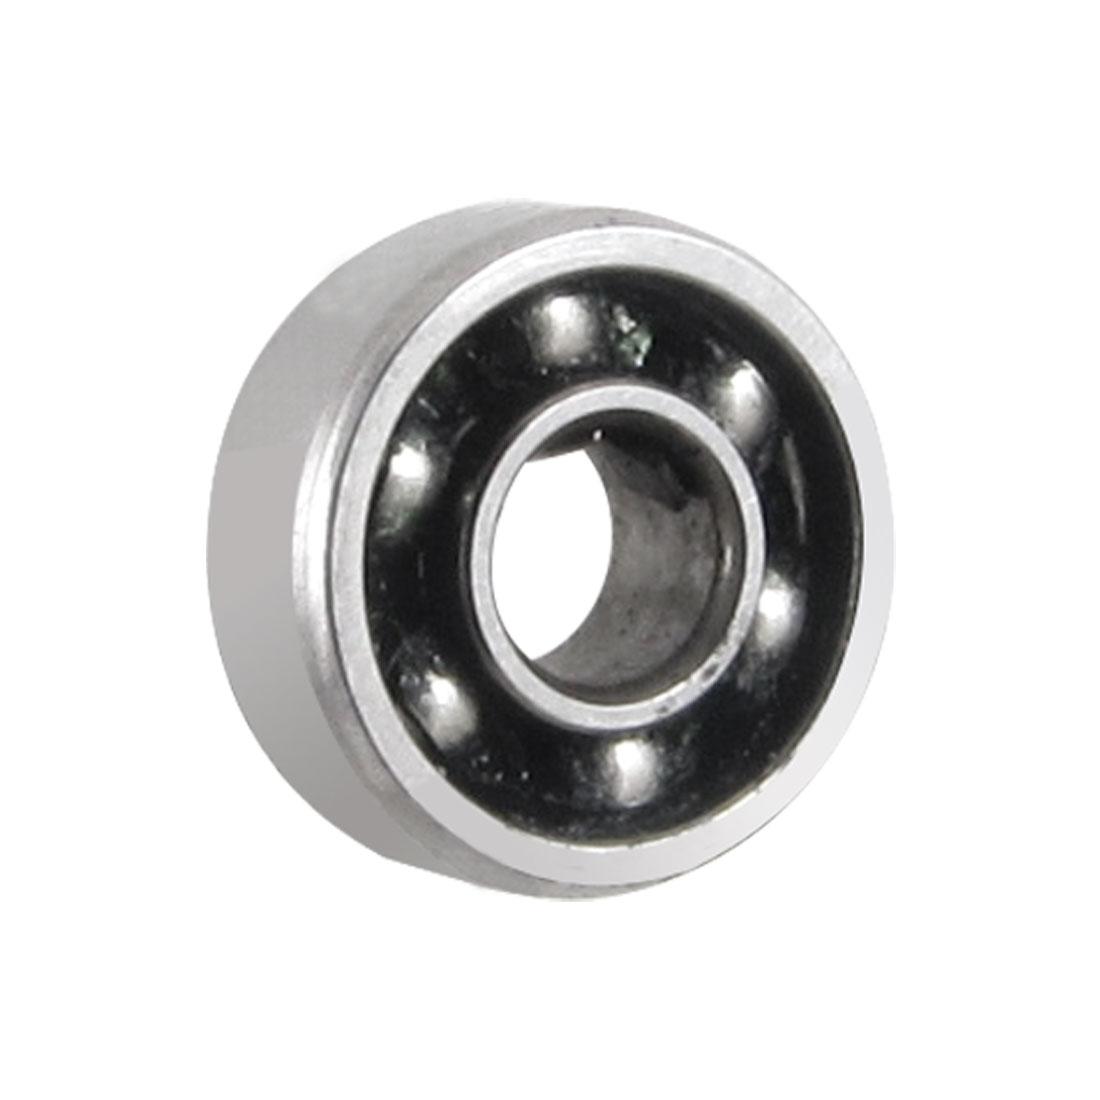 Stainless Steel 3mmx8mmx3mm Open Single Row Deep Groove Ball Bearing